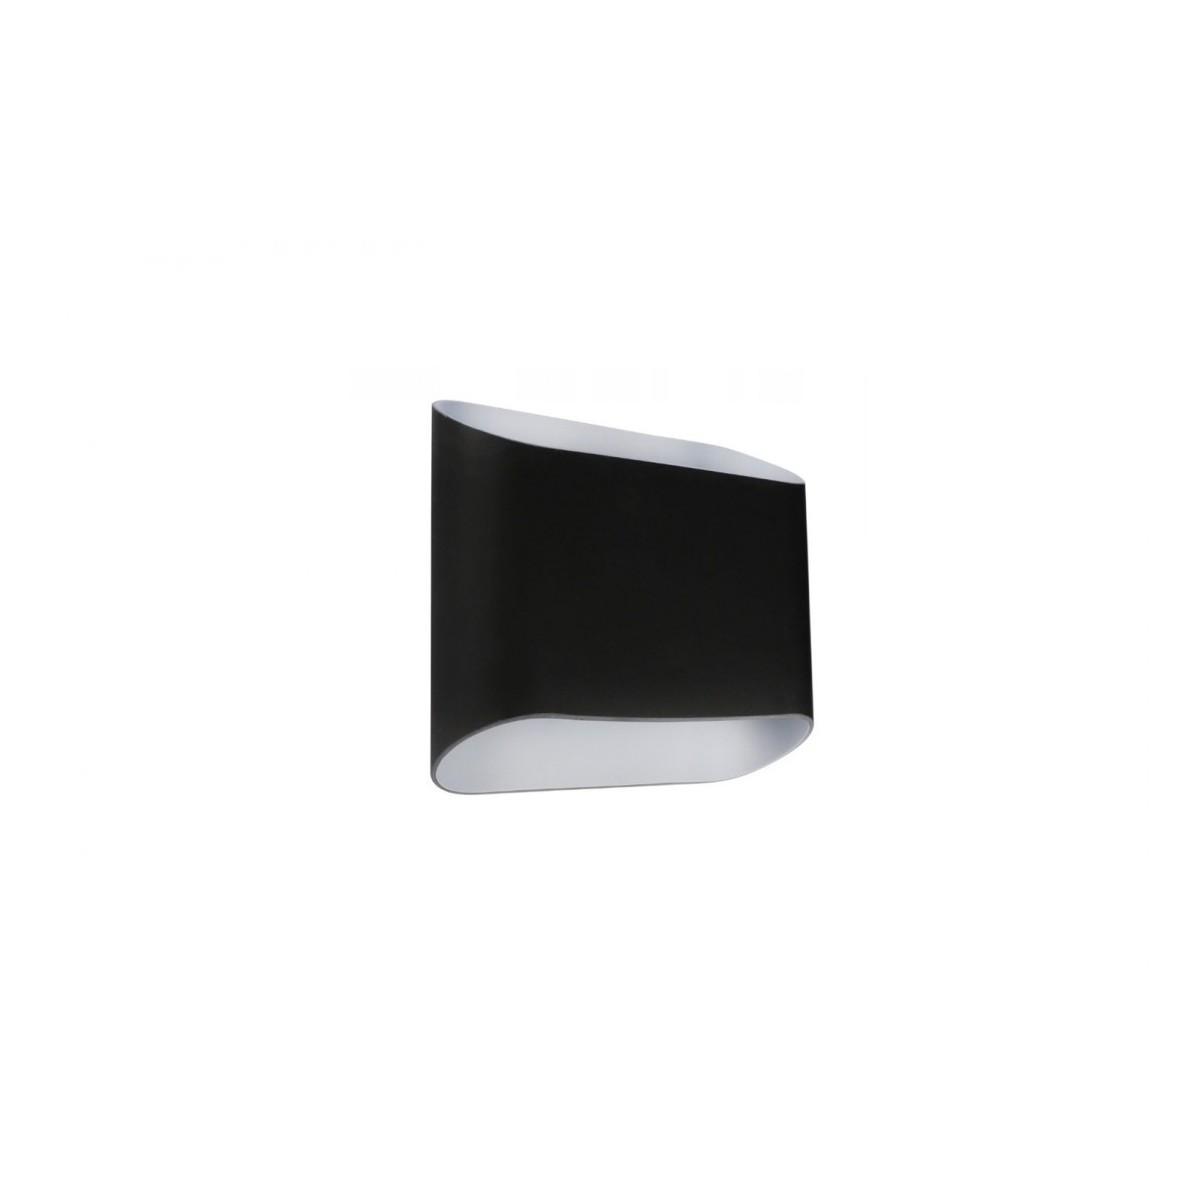 Azzardo PANCAKE BLACK 2xG9 Ścienna Czarny AZ0112